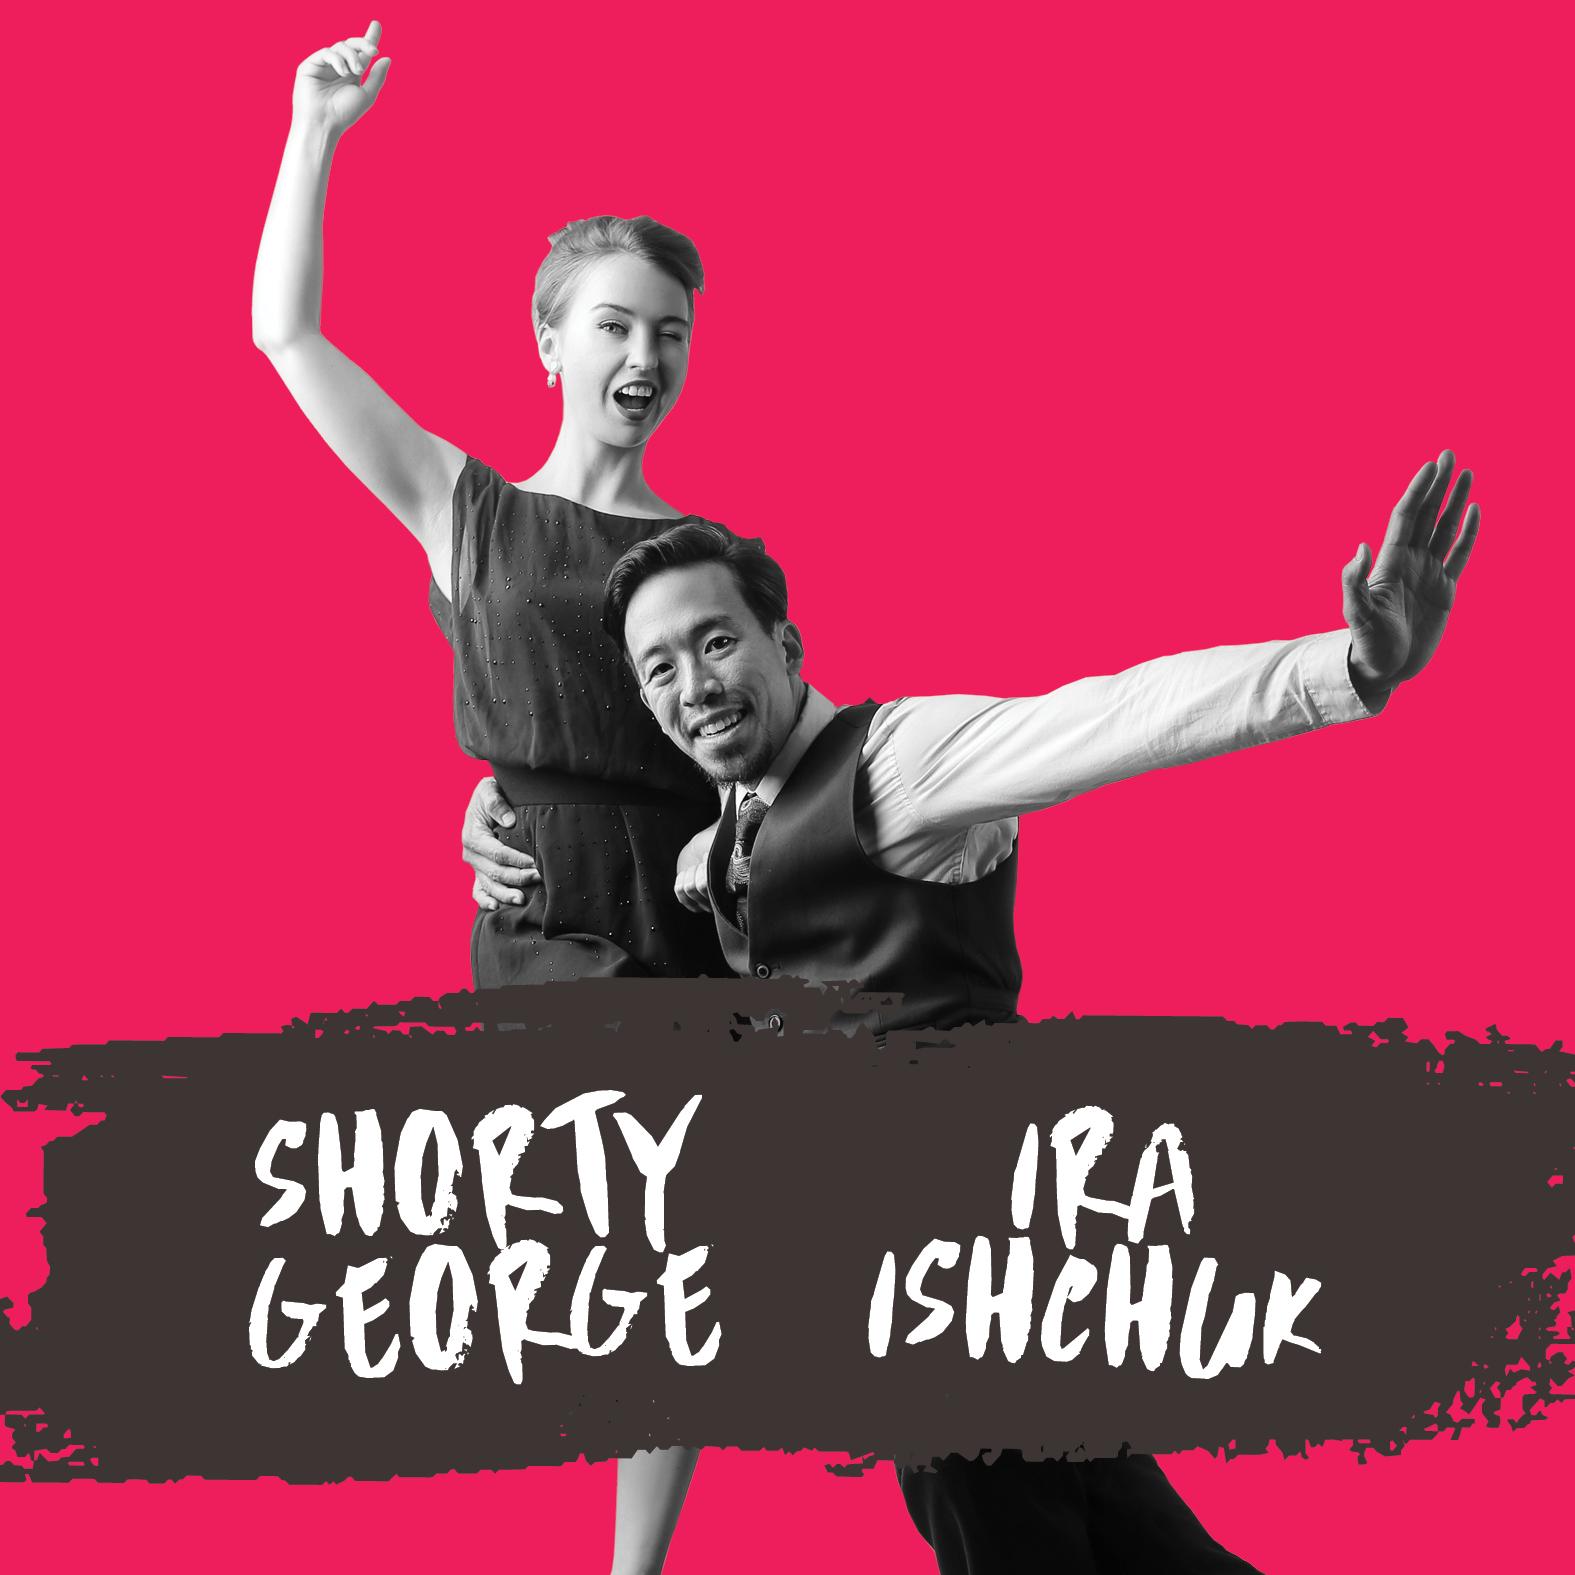 Shorty George & Ira Ishchuk